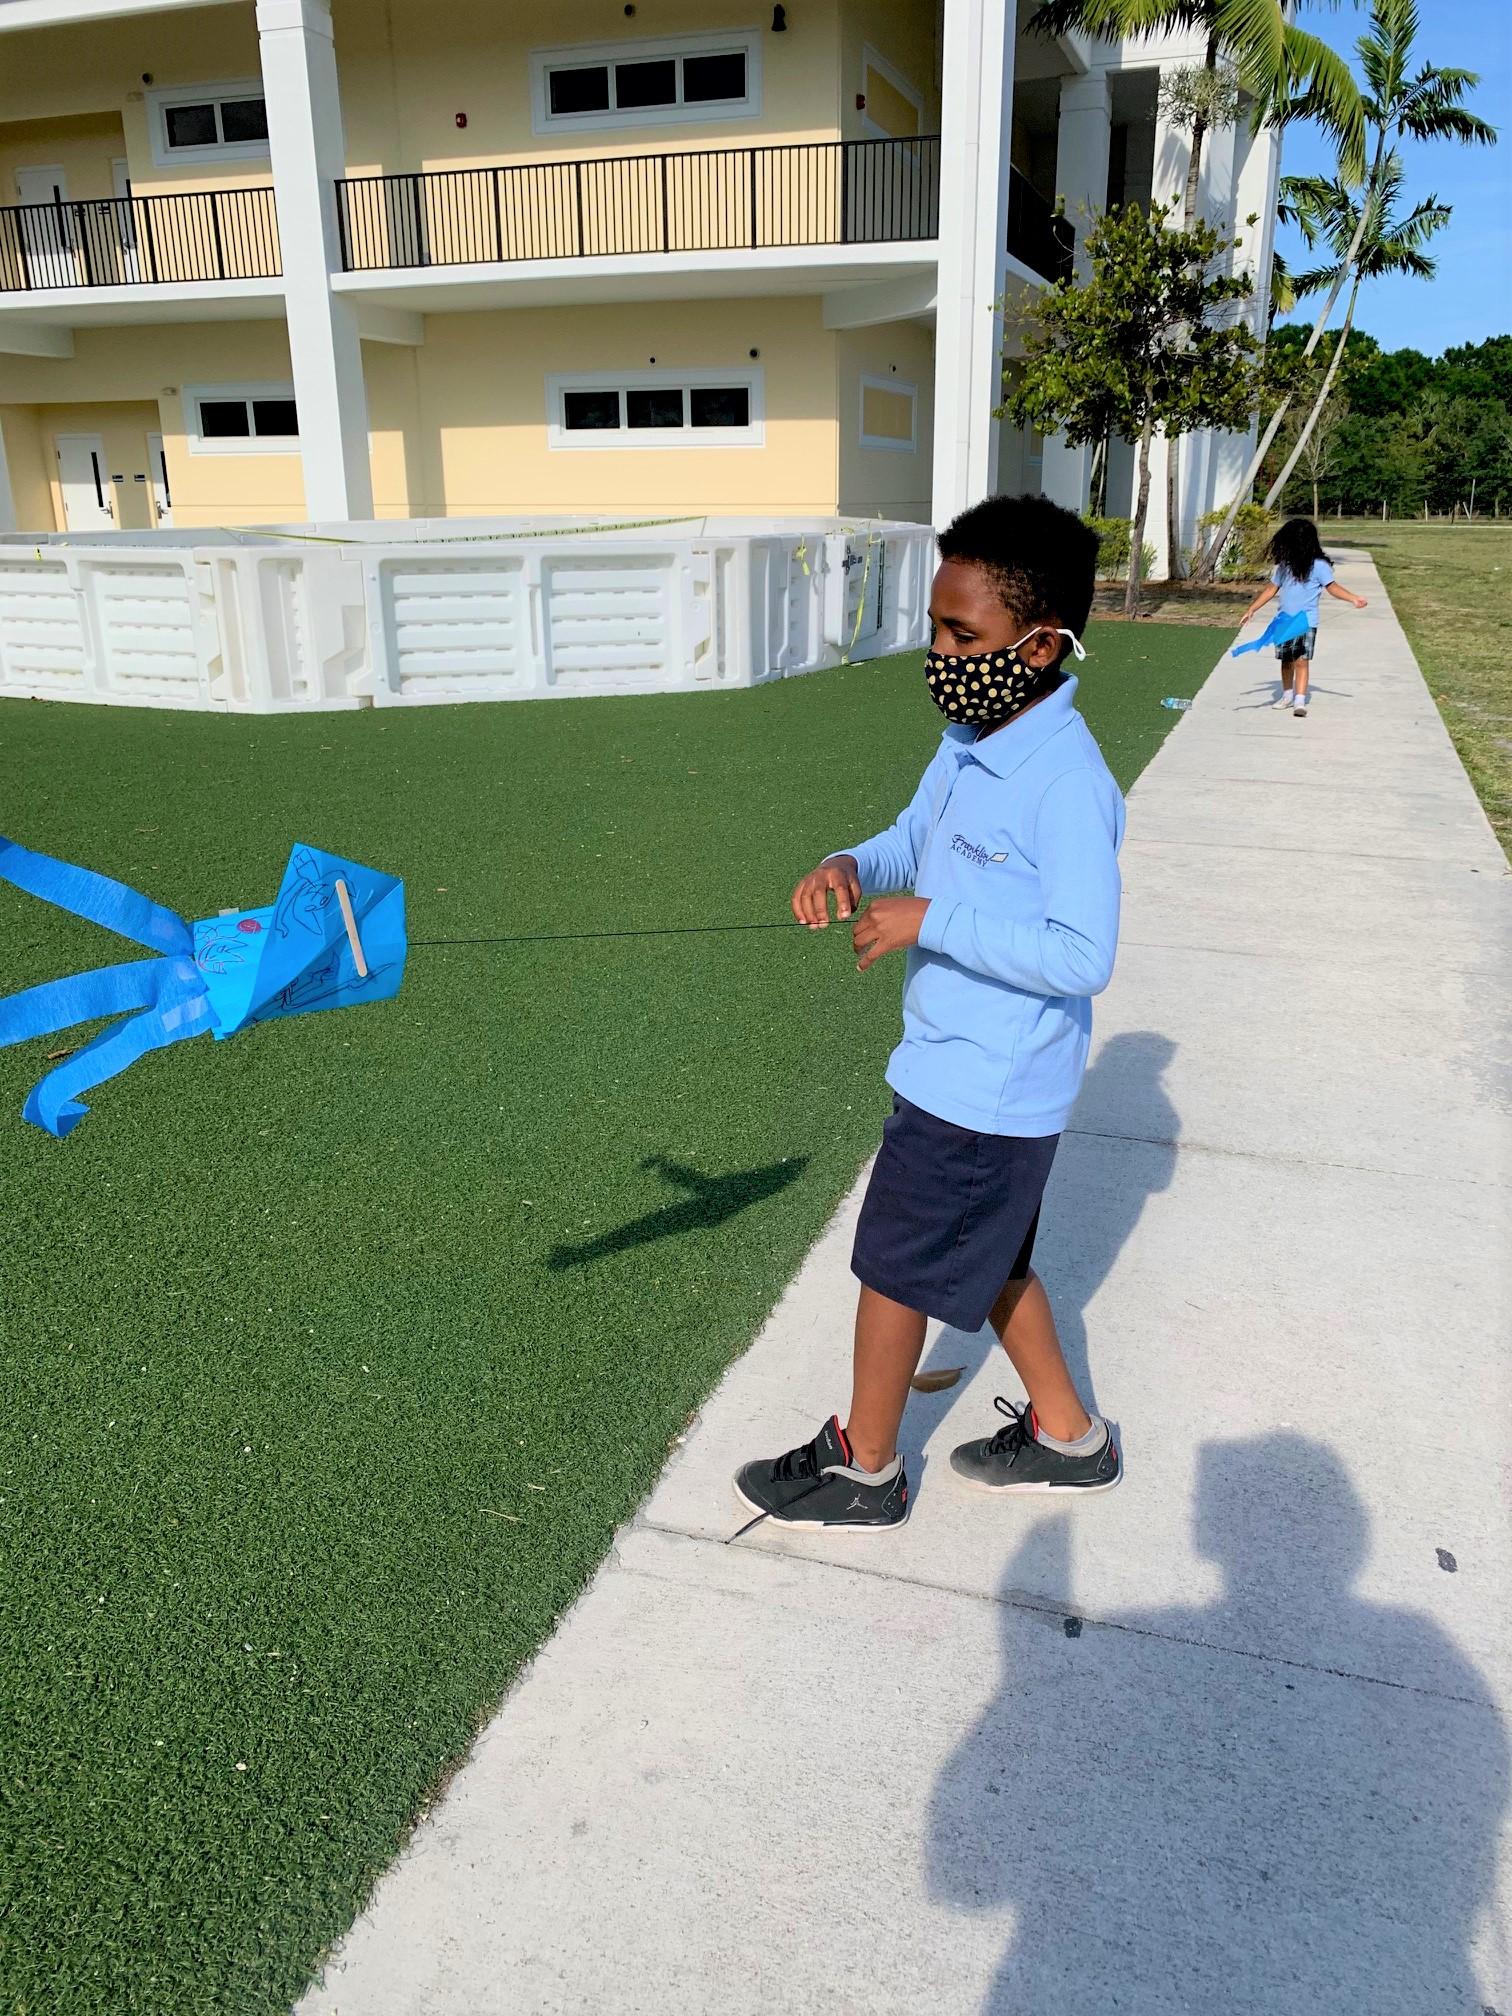 Kite Day Image number 5